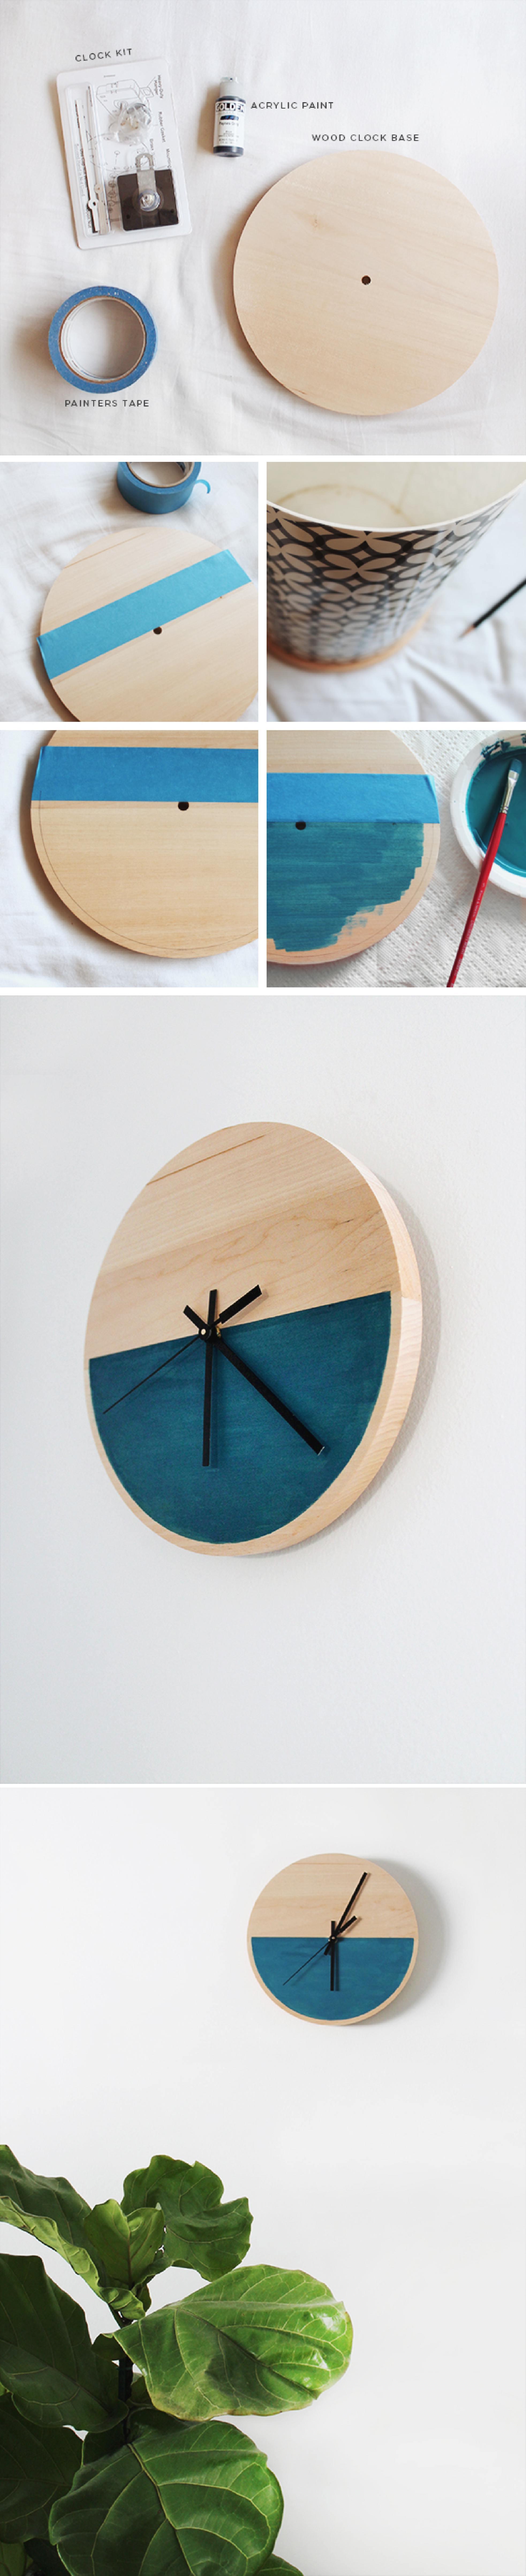 reloj-pared-DIY-muy-ingenioso-2 (1)